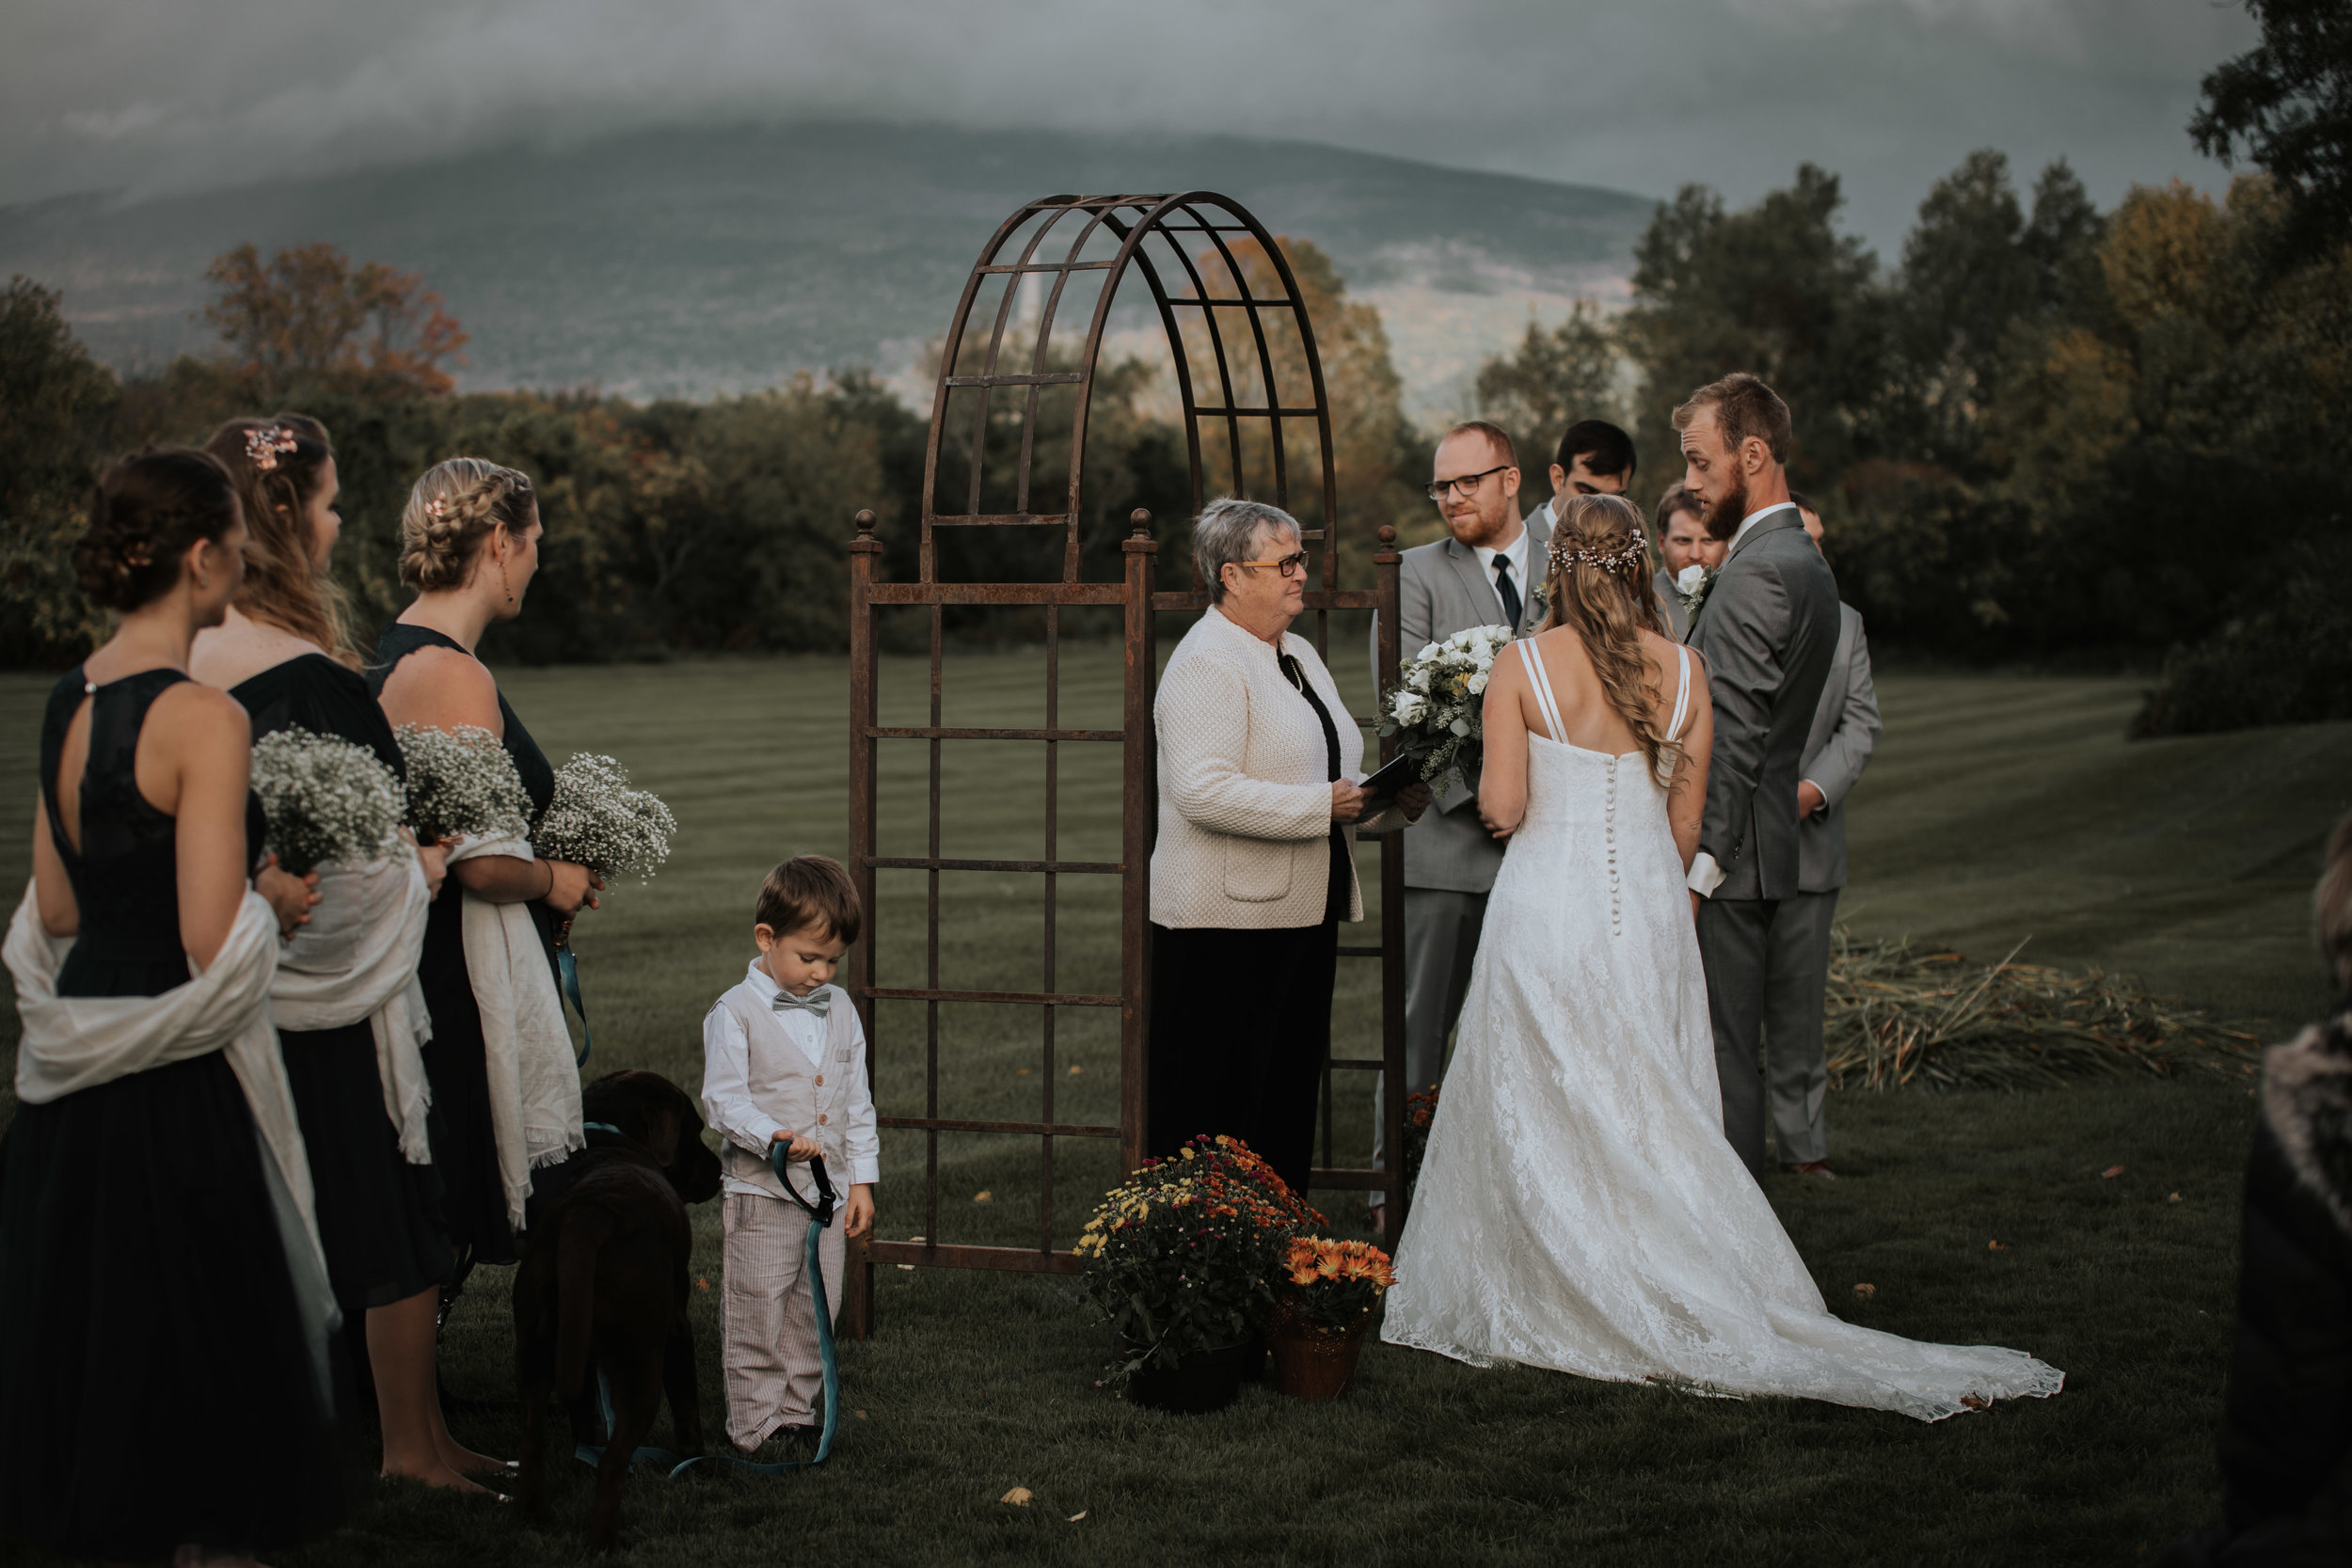 Vermont Wedding | Lorianna Weathers Photography-0532.jpg